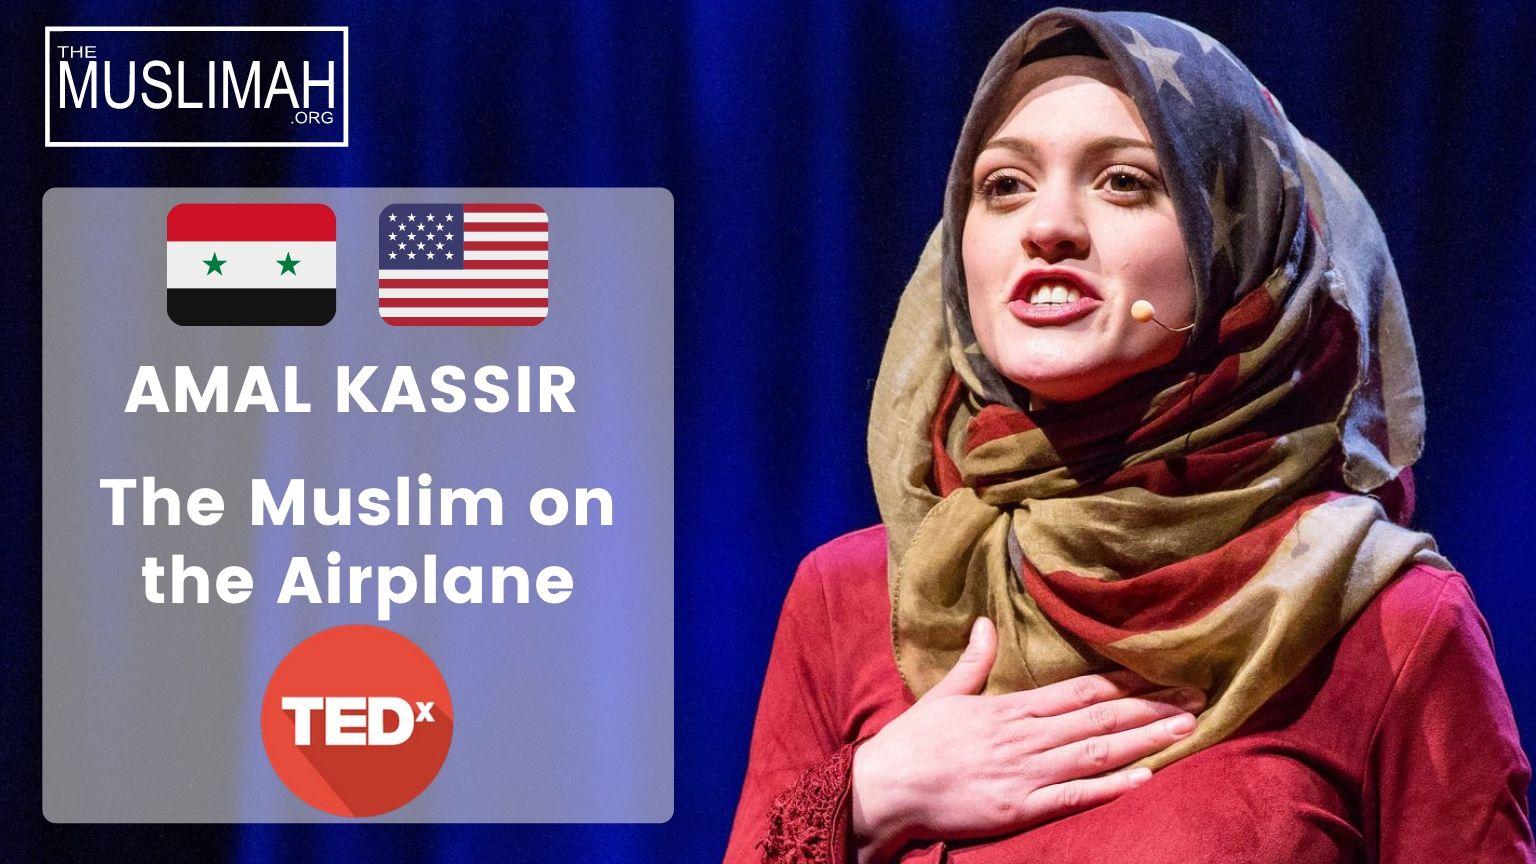 🇸🇾 🇺🇸 Amal Kassir 🧕 | The Muslim on the Airplane | TEDxMileHighWomen